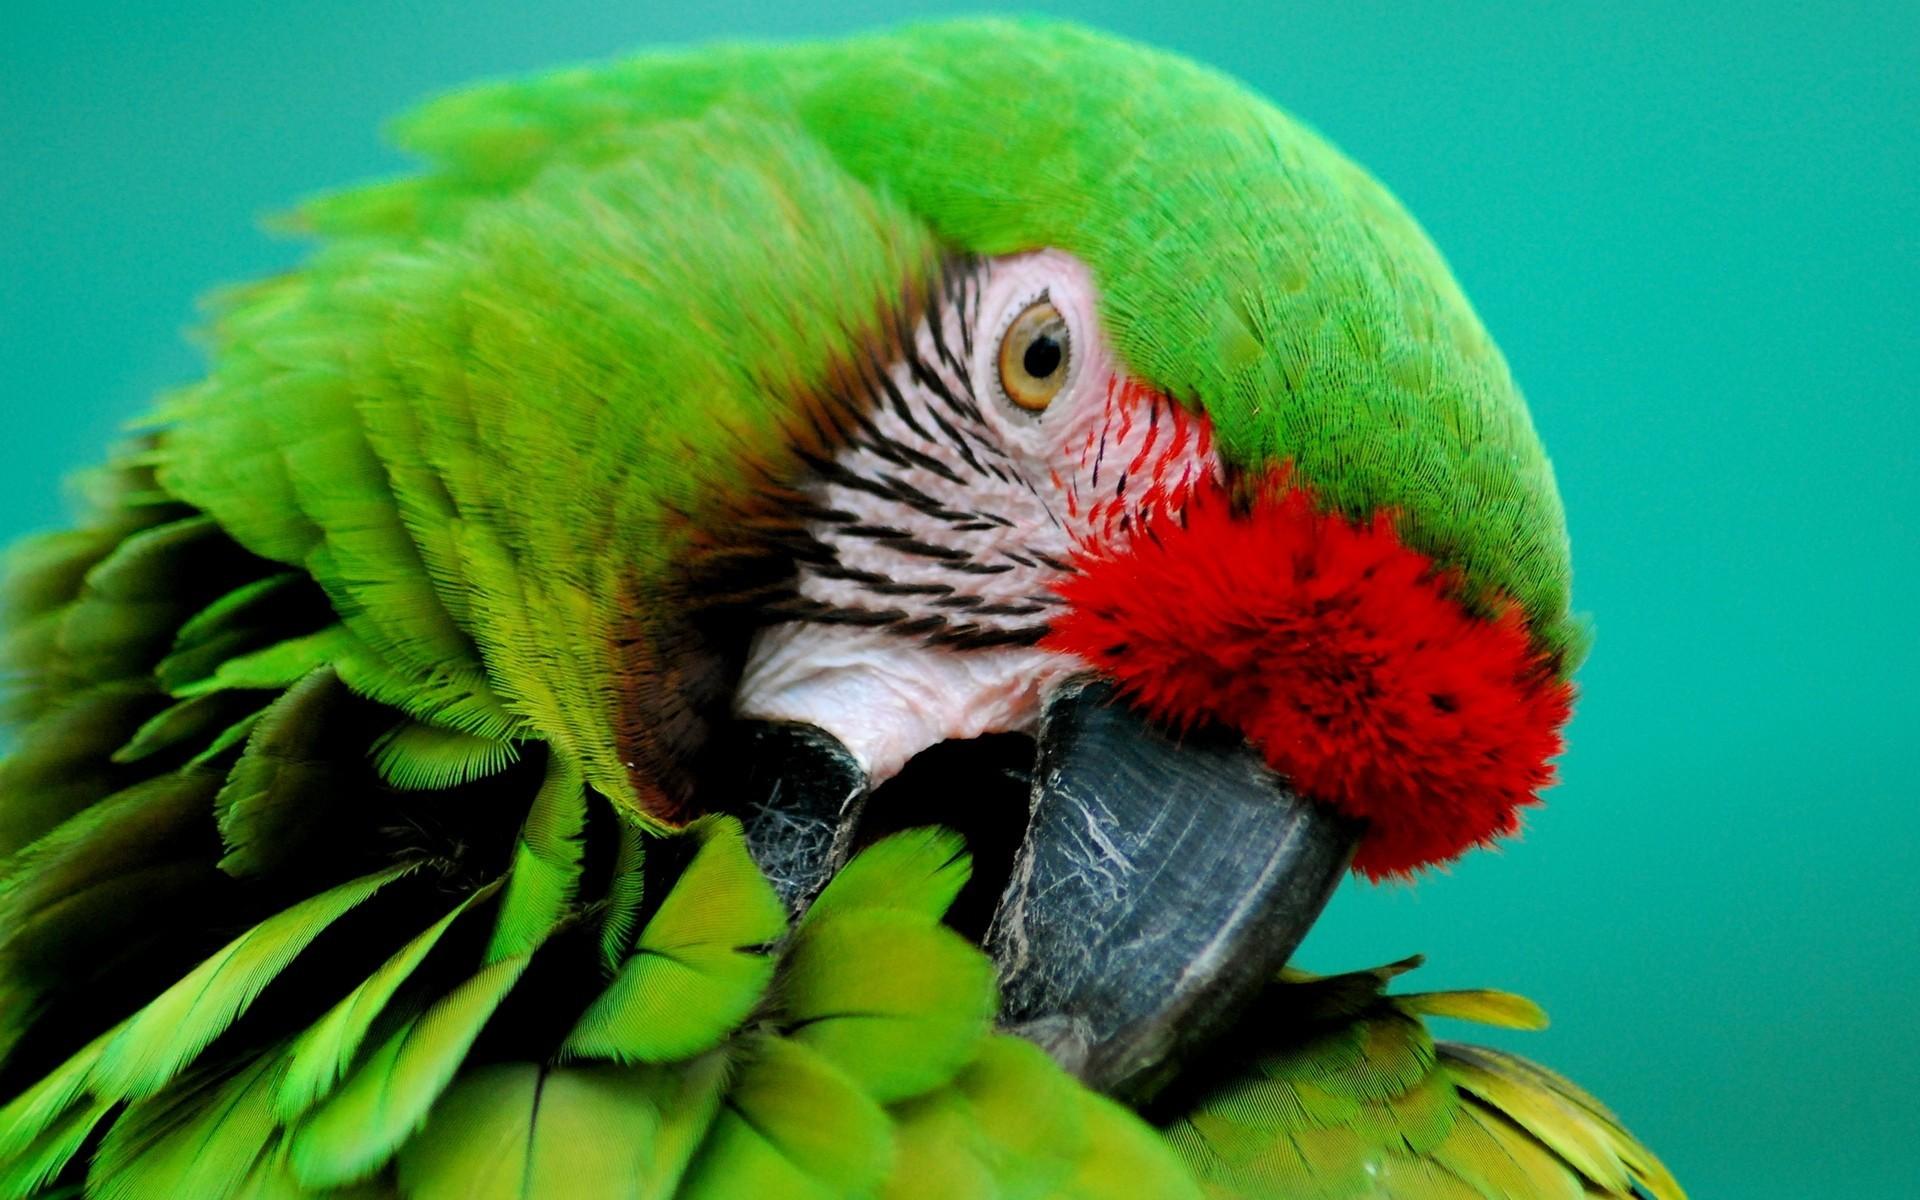 parrot hd 1080p desktop wallpaper 0009